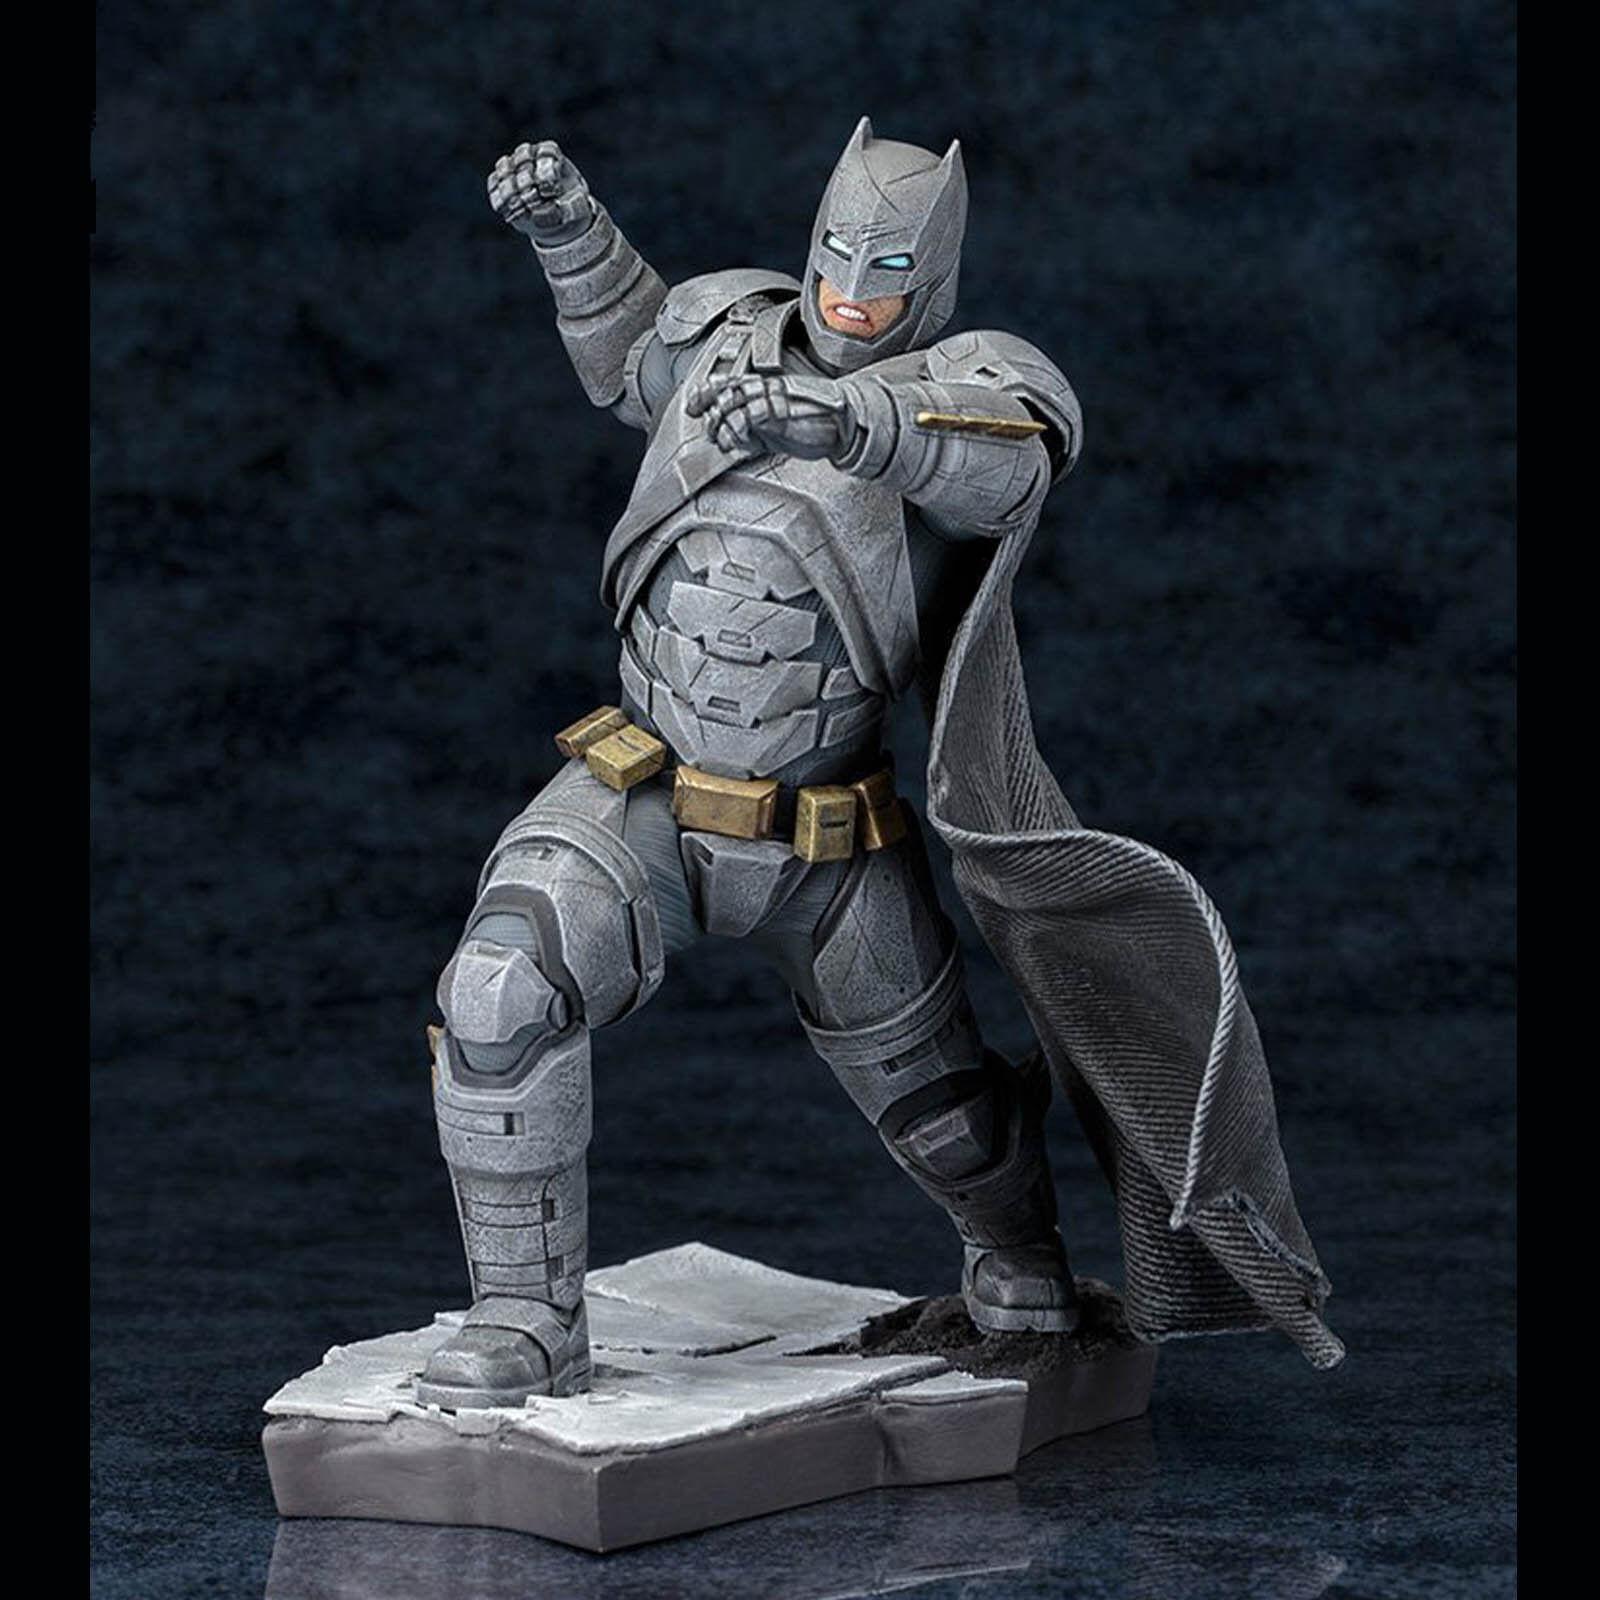 Kotobukiya Batman Vs Superman Batman ArtFX Statue Figure NEW Collectibles Armor